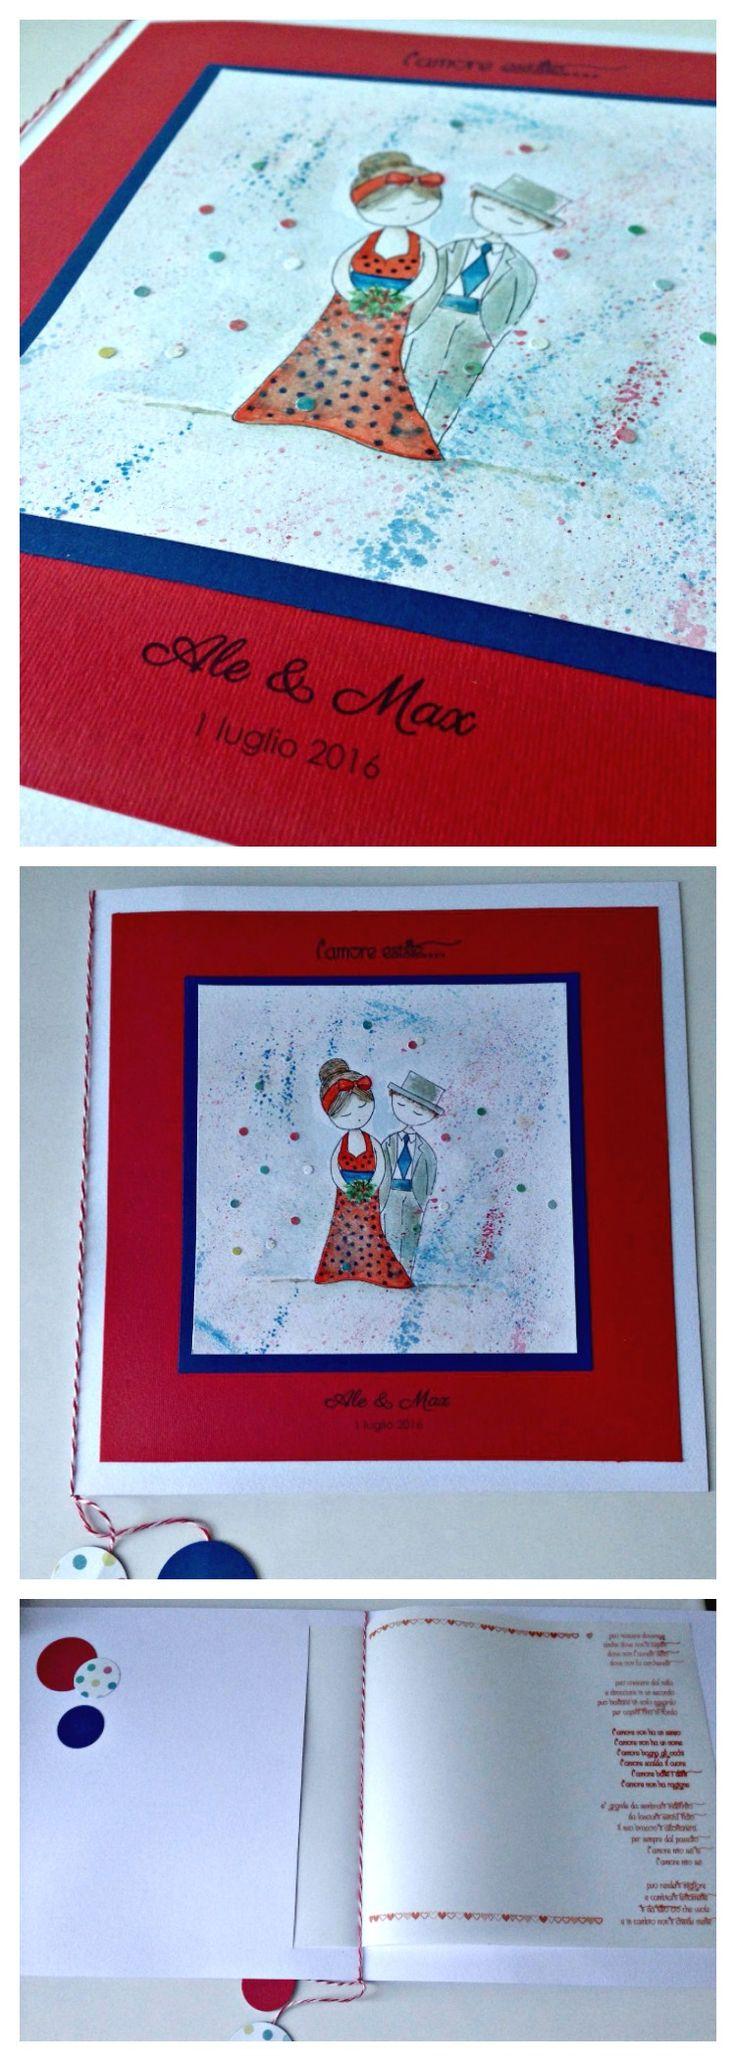 Dolci sposini Ale & Max. #wedding #weddingcard #weddingday #oggisposi #nozze #papercraft #celebrate #pinup #pois #fattoamanoconamore #madeinitaly #lacasasullalbero #savethedate #loveyou #handmadewithcare #handcrafted #savethedate